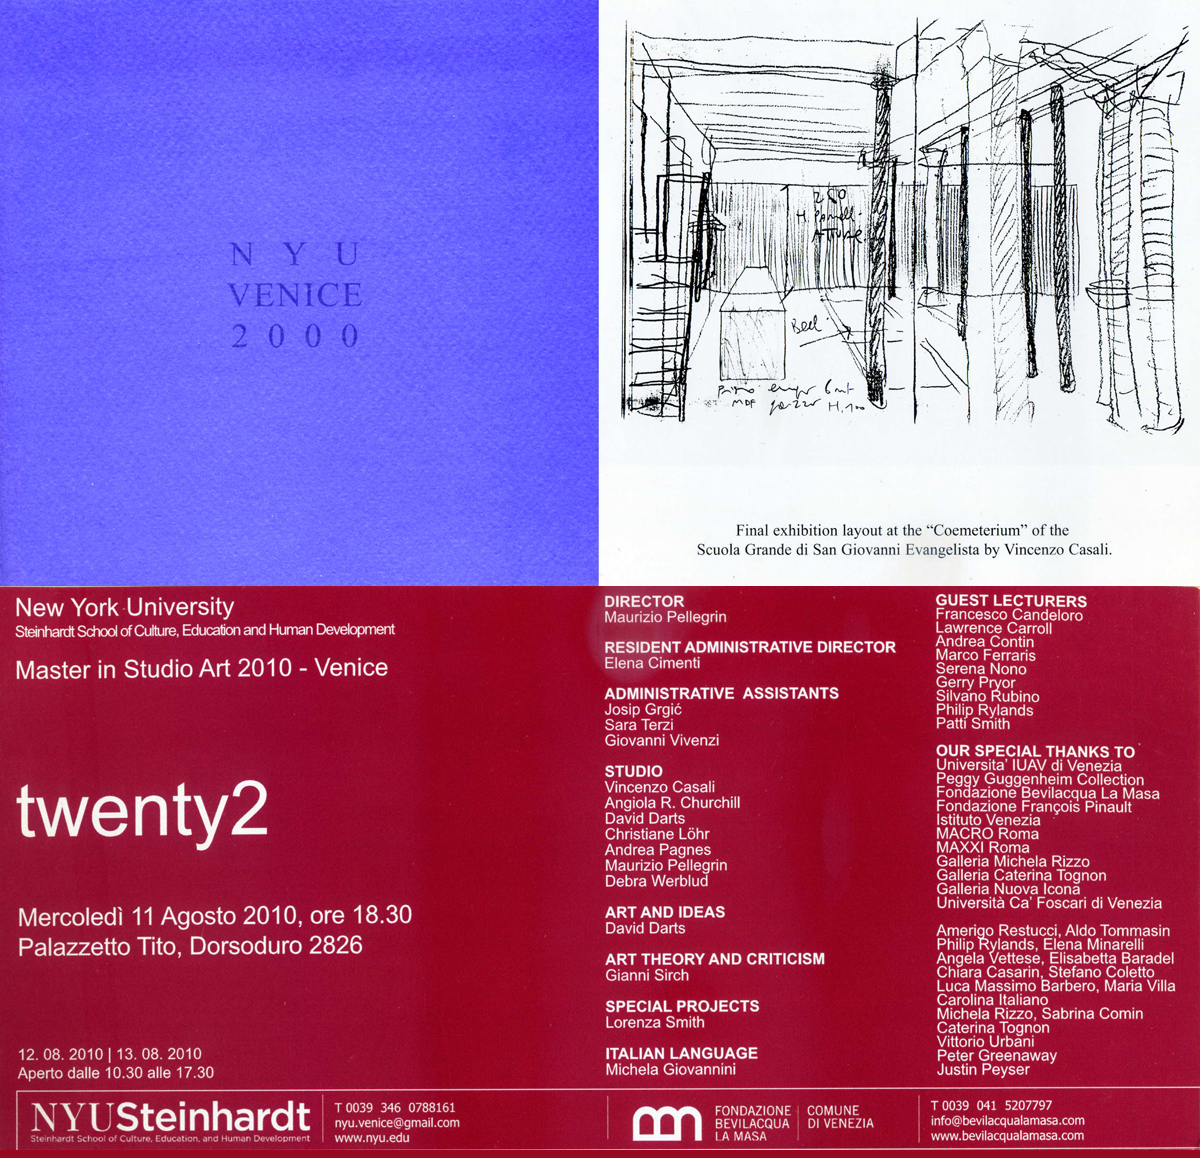 Teacher in the Studio, NYU Steinhardt, Master in Studio Art, New York University in Venice, 2001/2011